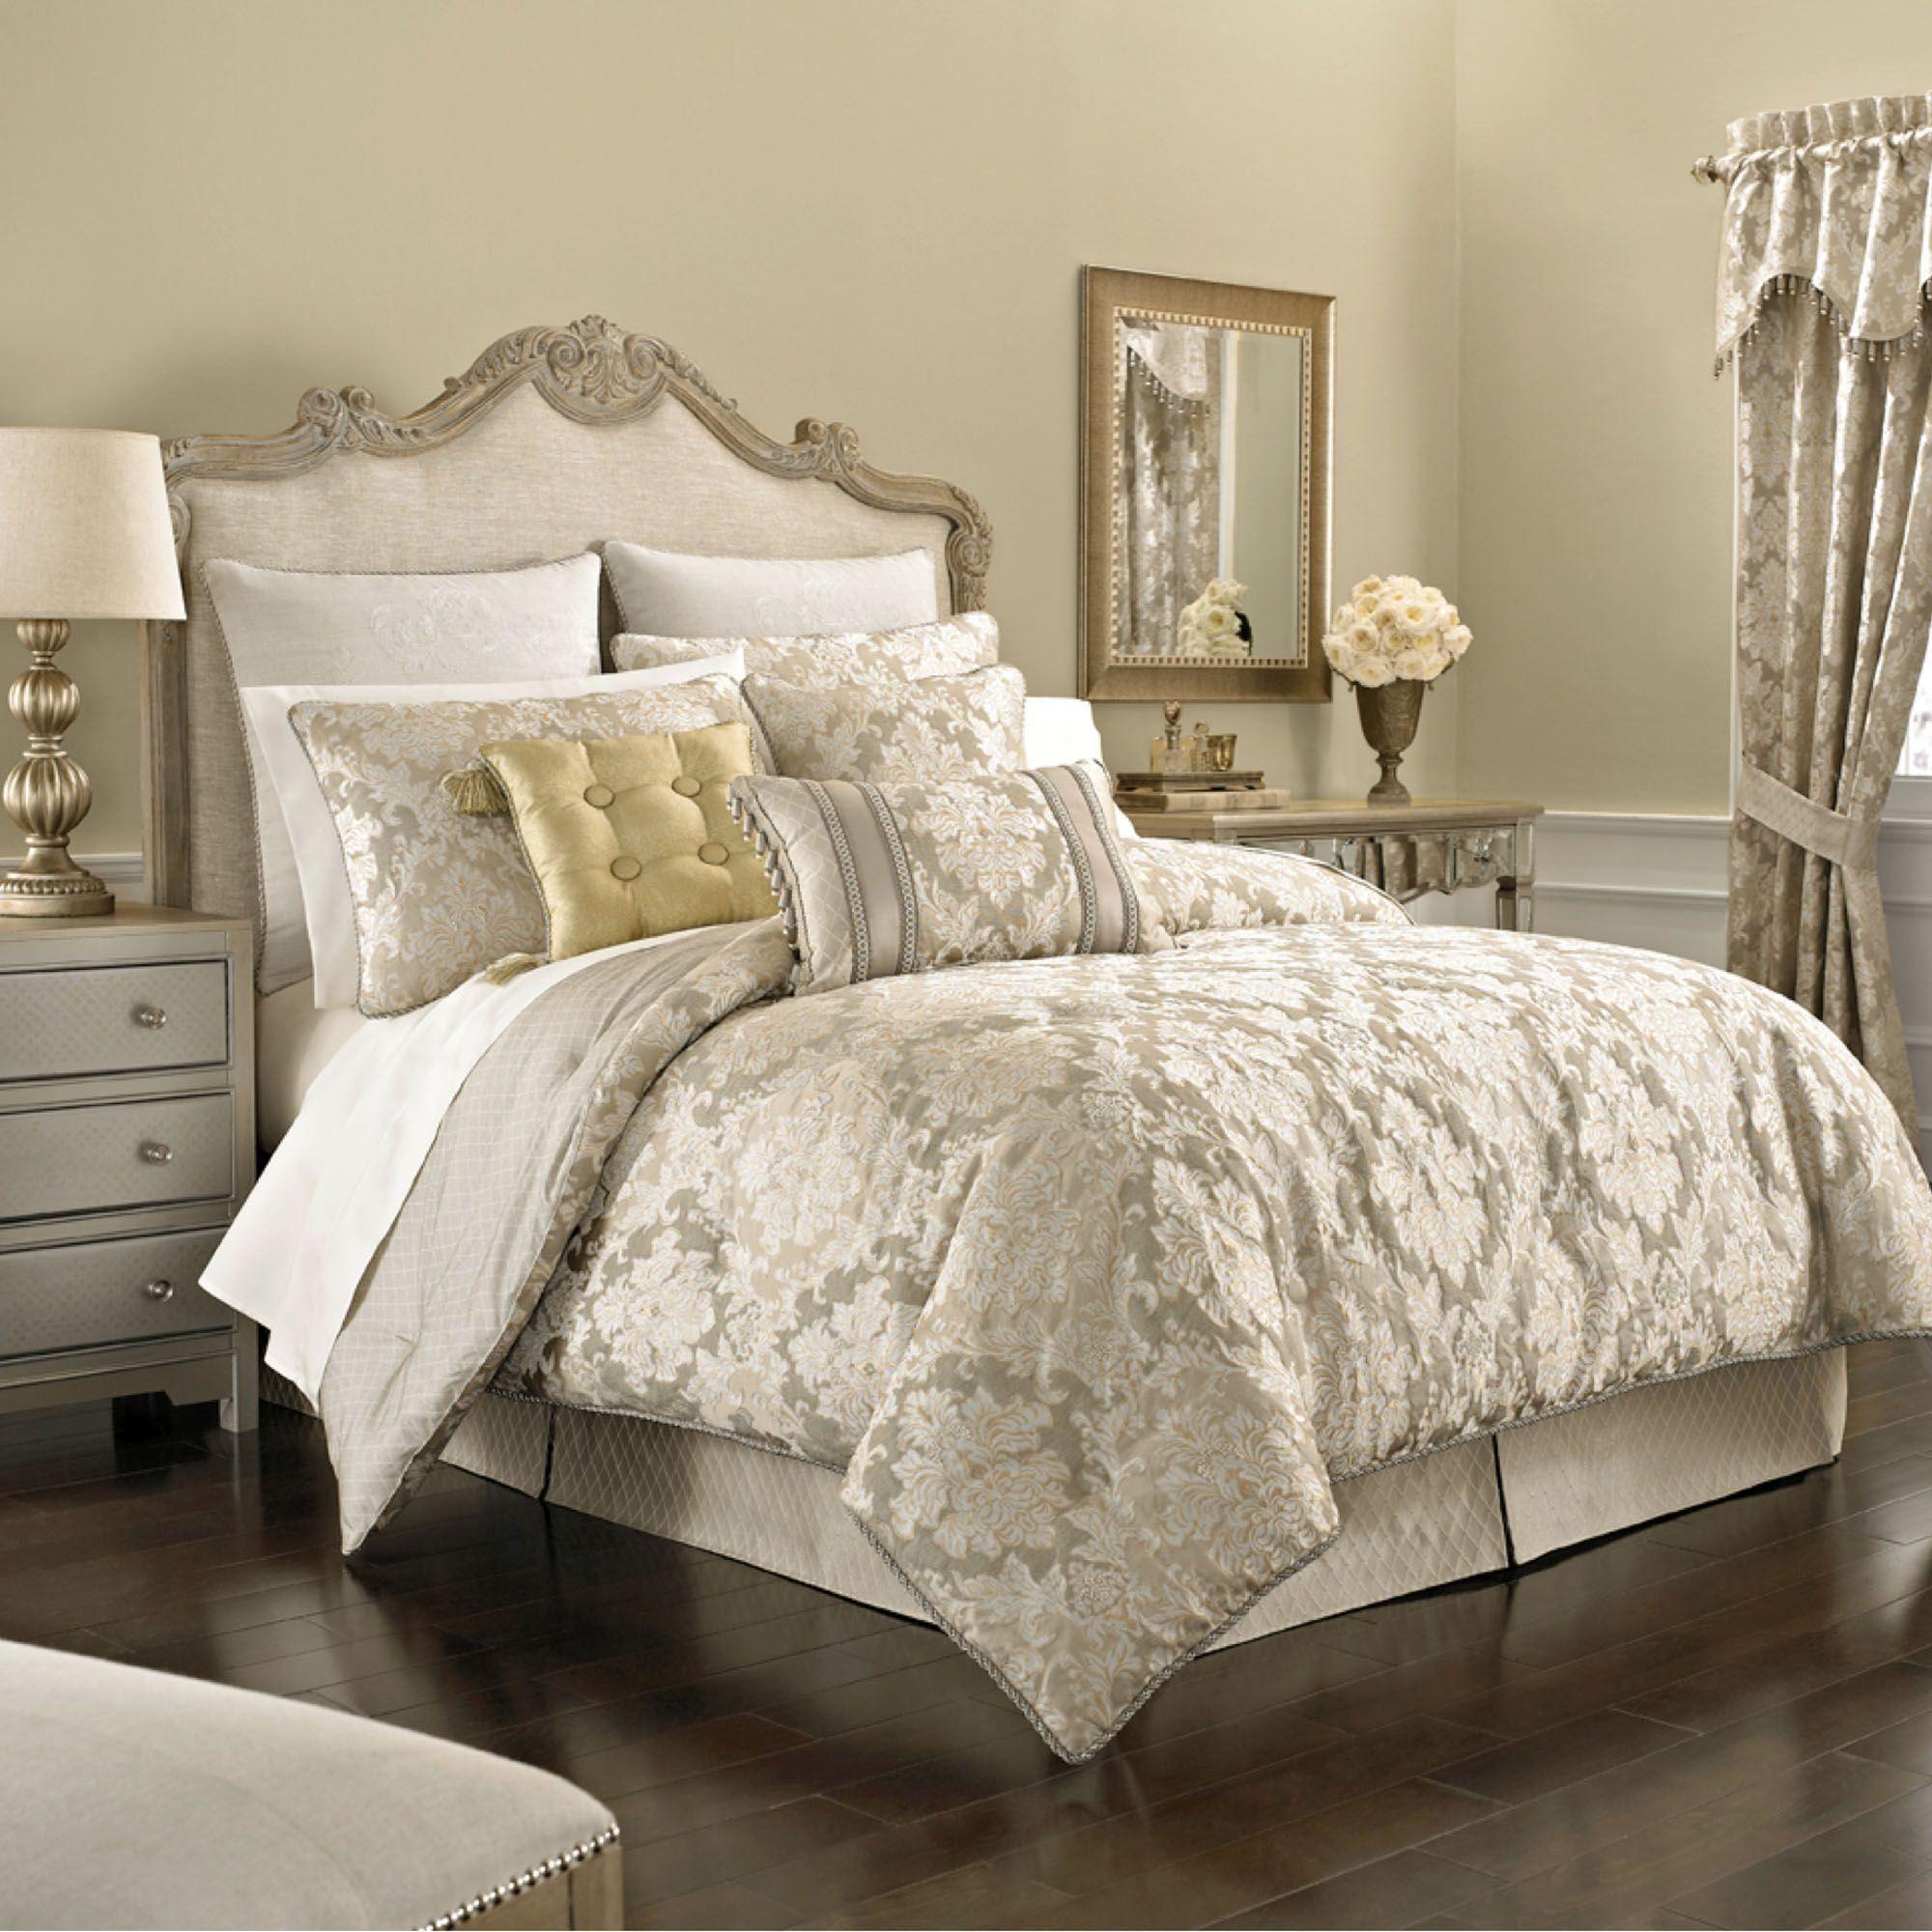 Ava Leaf Comforter Bedding By Croscill